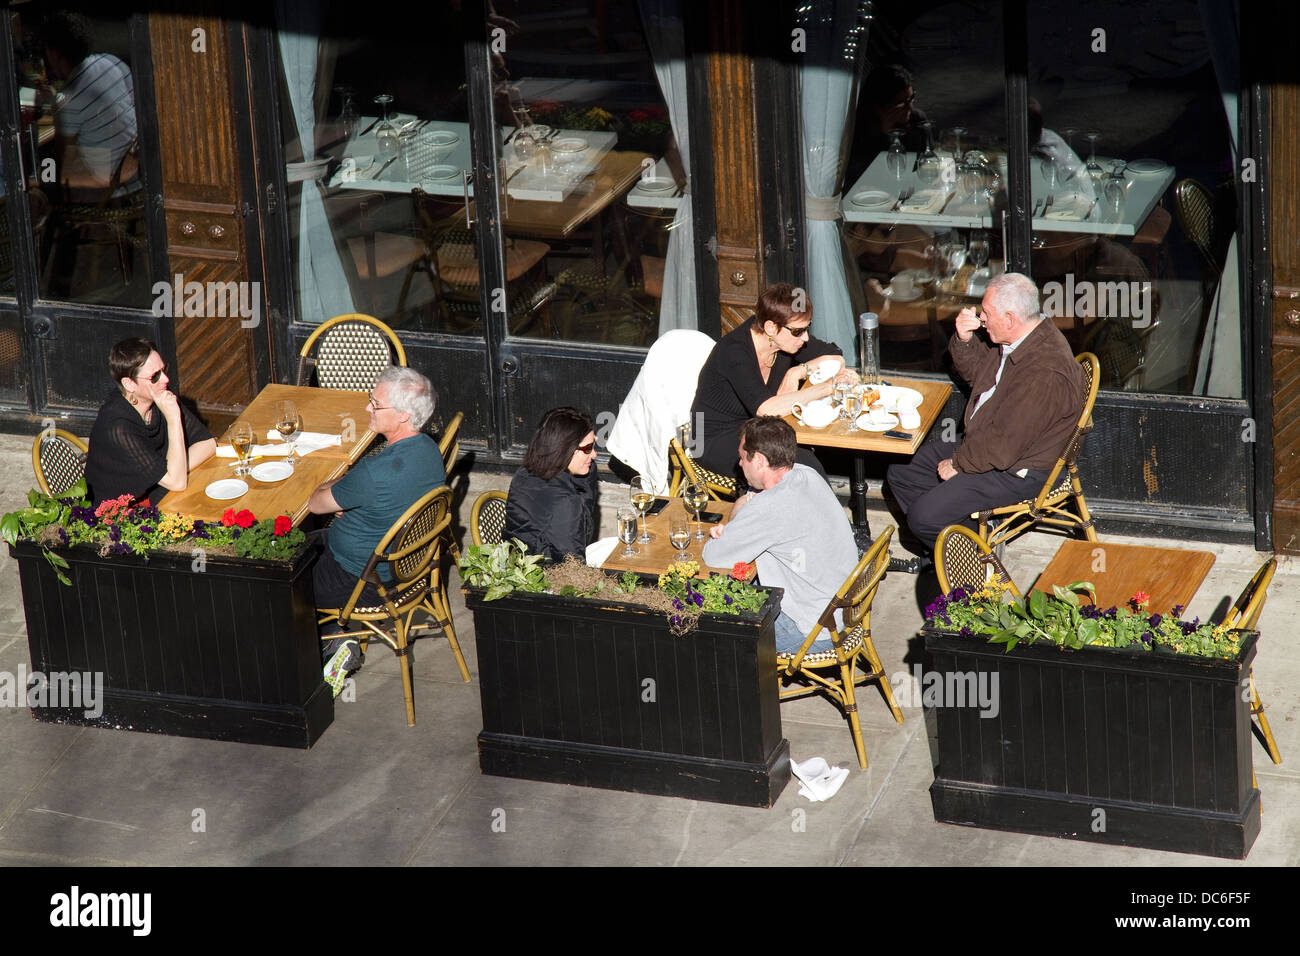 New York sidewalk cafe, sidewalk restaurant, street scene. - Stock Image